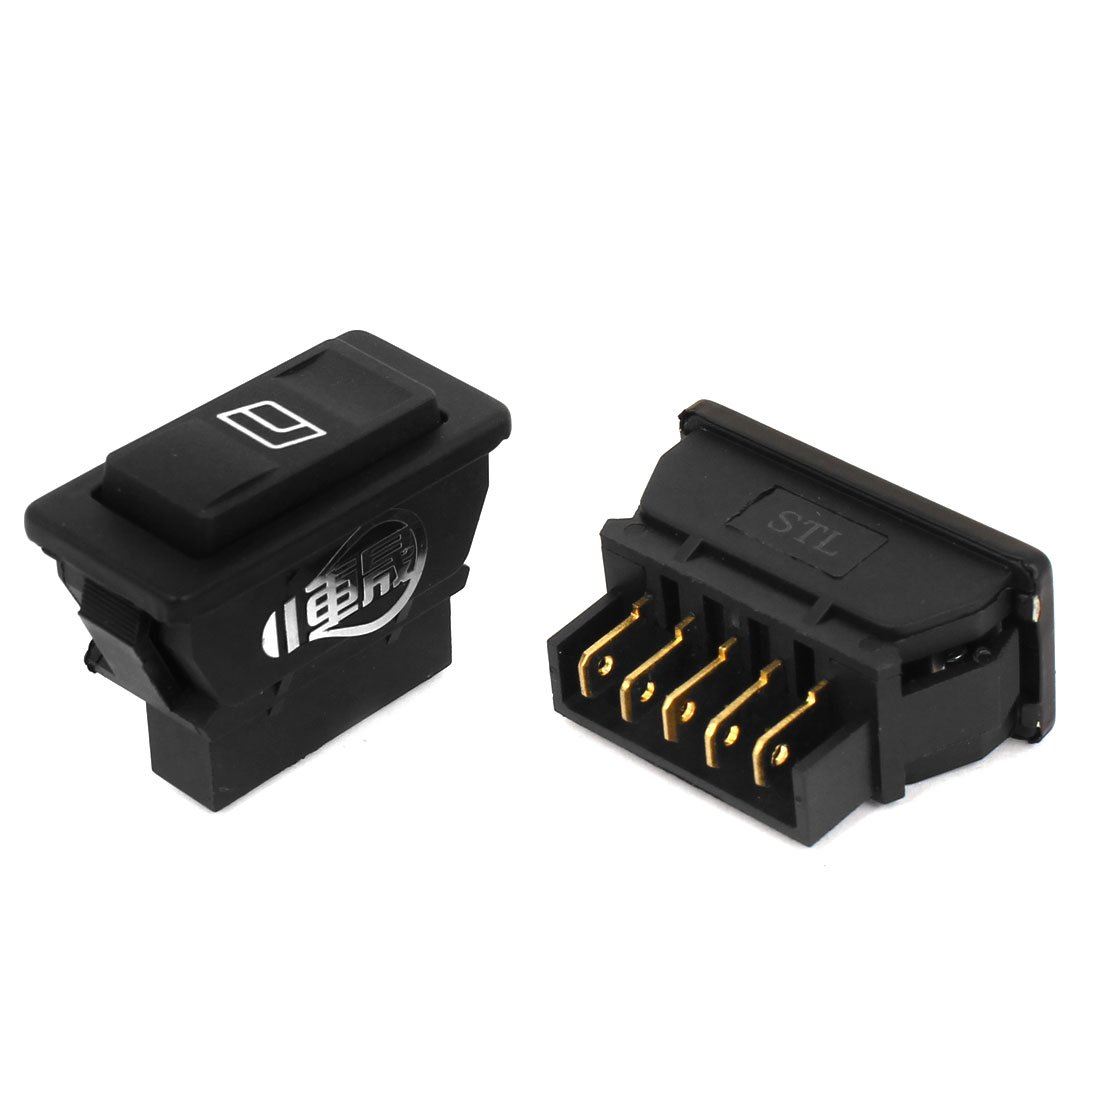 2pcs 5 Pins Power Window Door Lock Rocker Switches Relay 24v Pin Bosch Automotive